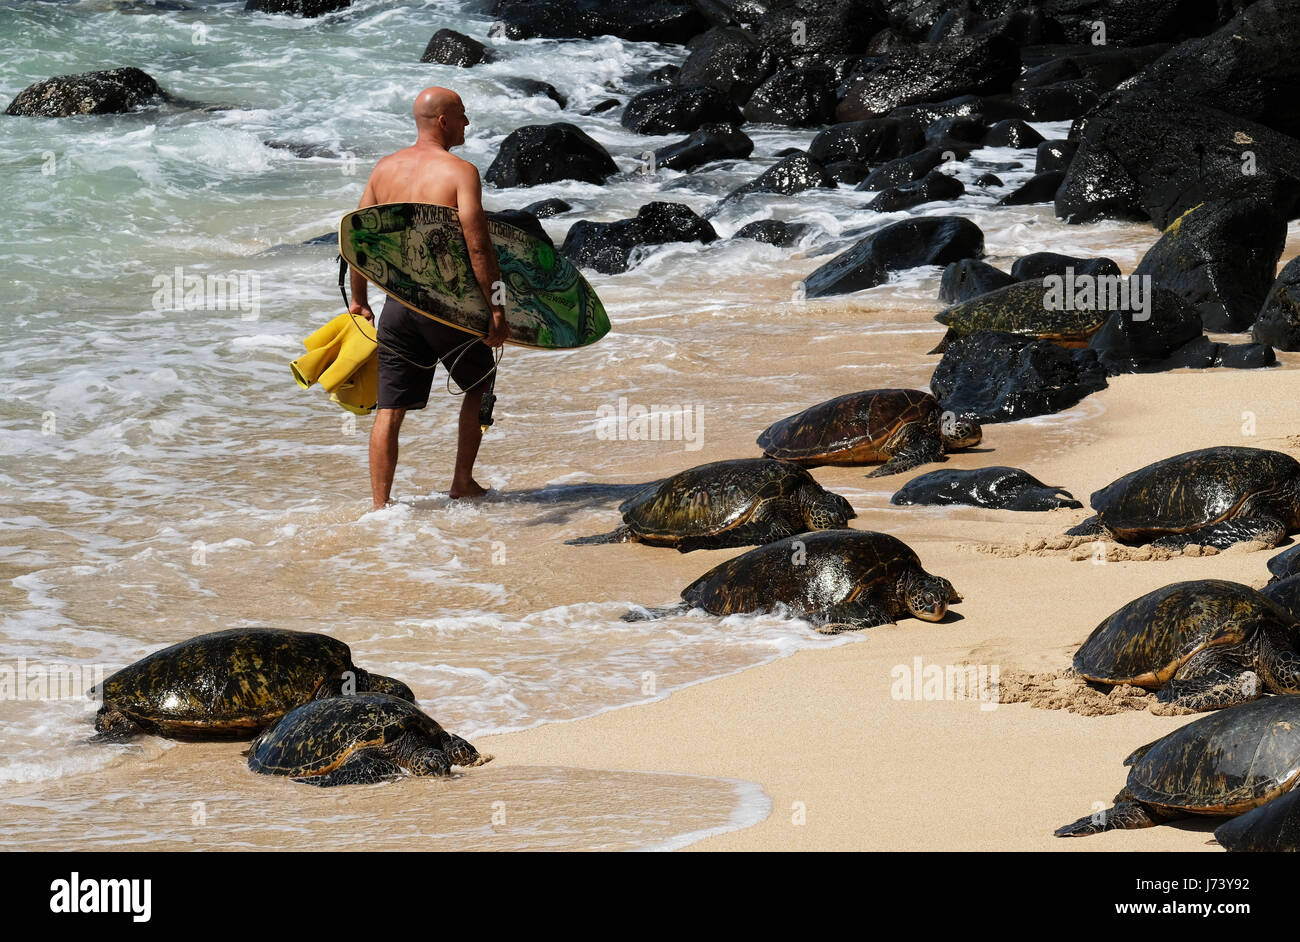 A surfer walks past a group of resting Hawaiian Green Sea Turtles at Hookipa Beach park, Paia, Maui, Hawaii. - Stock Image